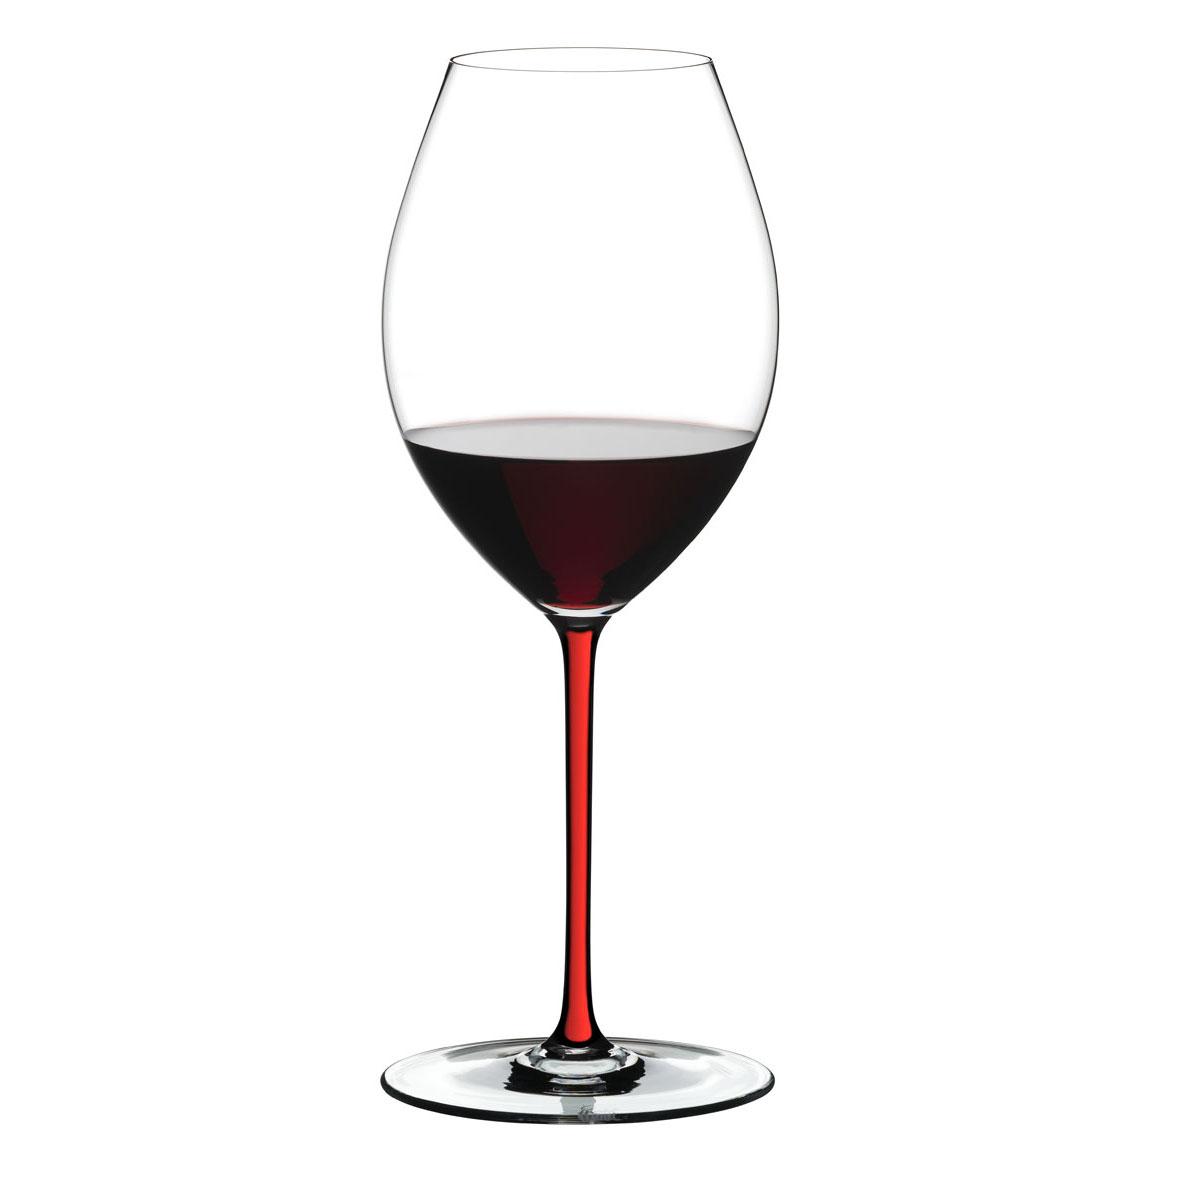 Riedel Fatto A Mano, Old World Syrah Wine Glass, Red